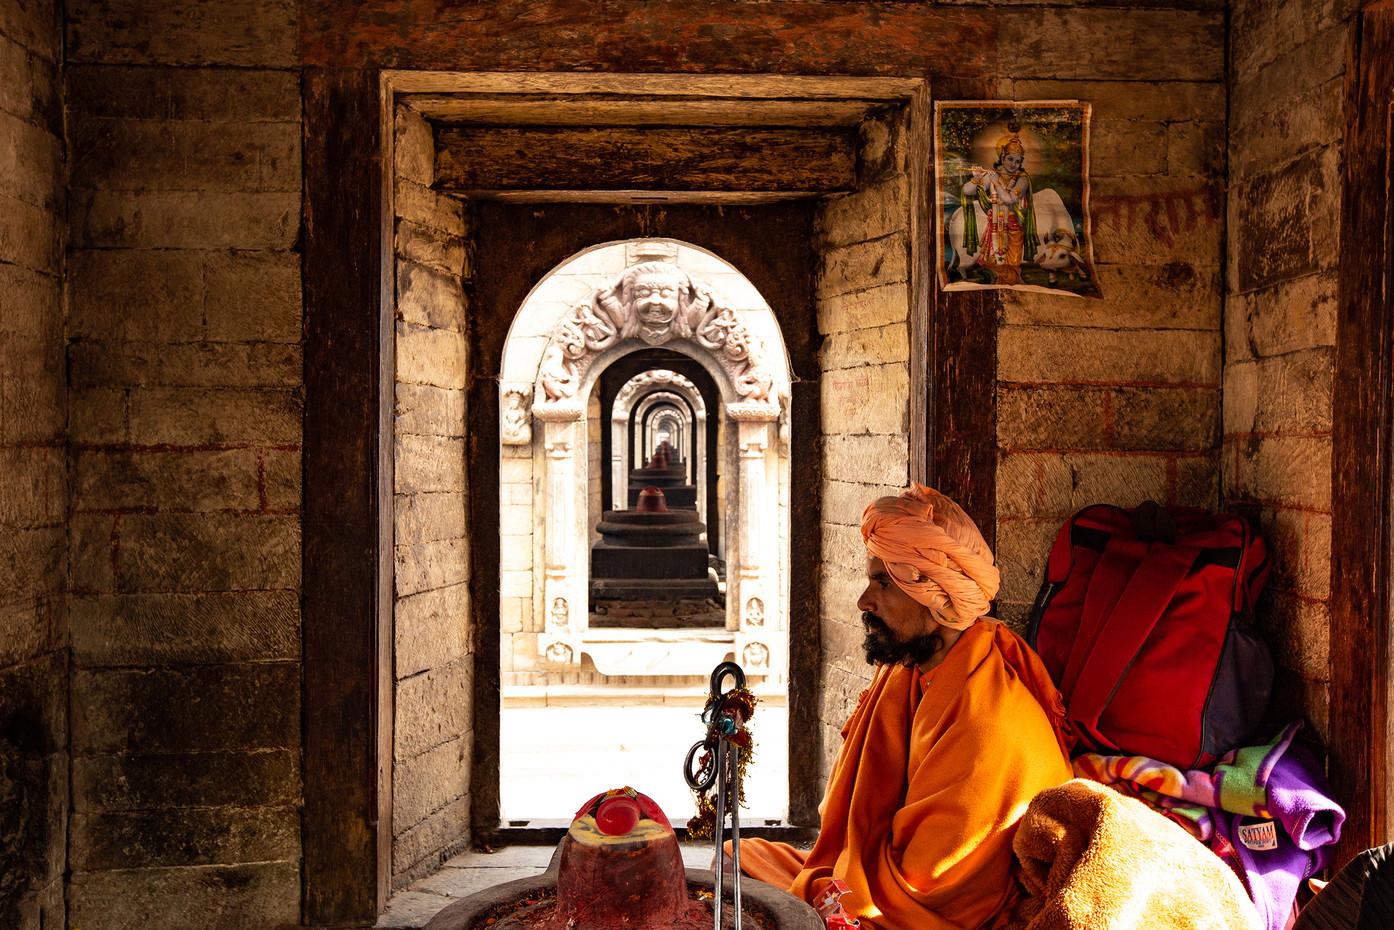 Sadhu holy man in Kathmandu, Nepal